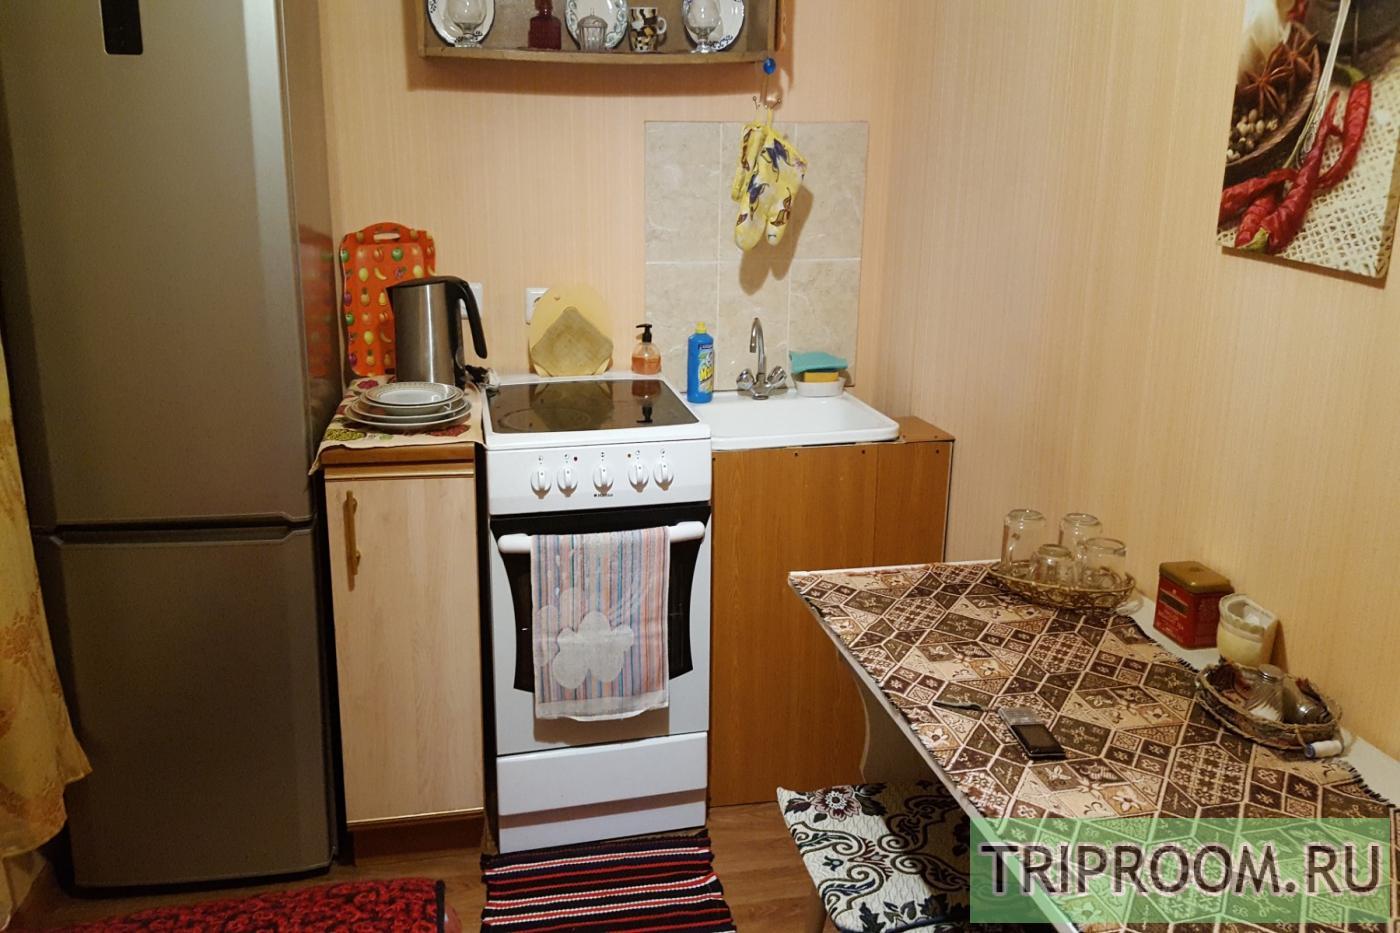 1-комнатная квартира посуточно (вариант № 30847), ул. Строителей улица, фото № 13